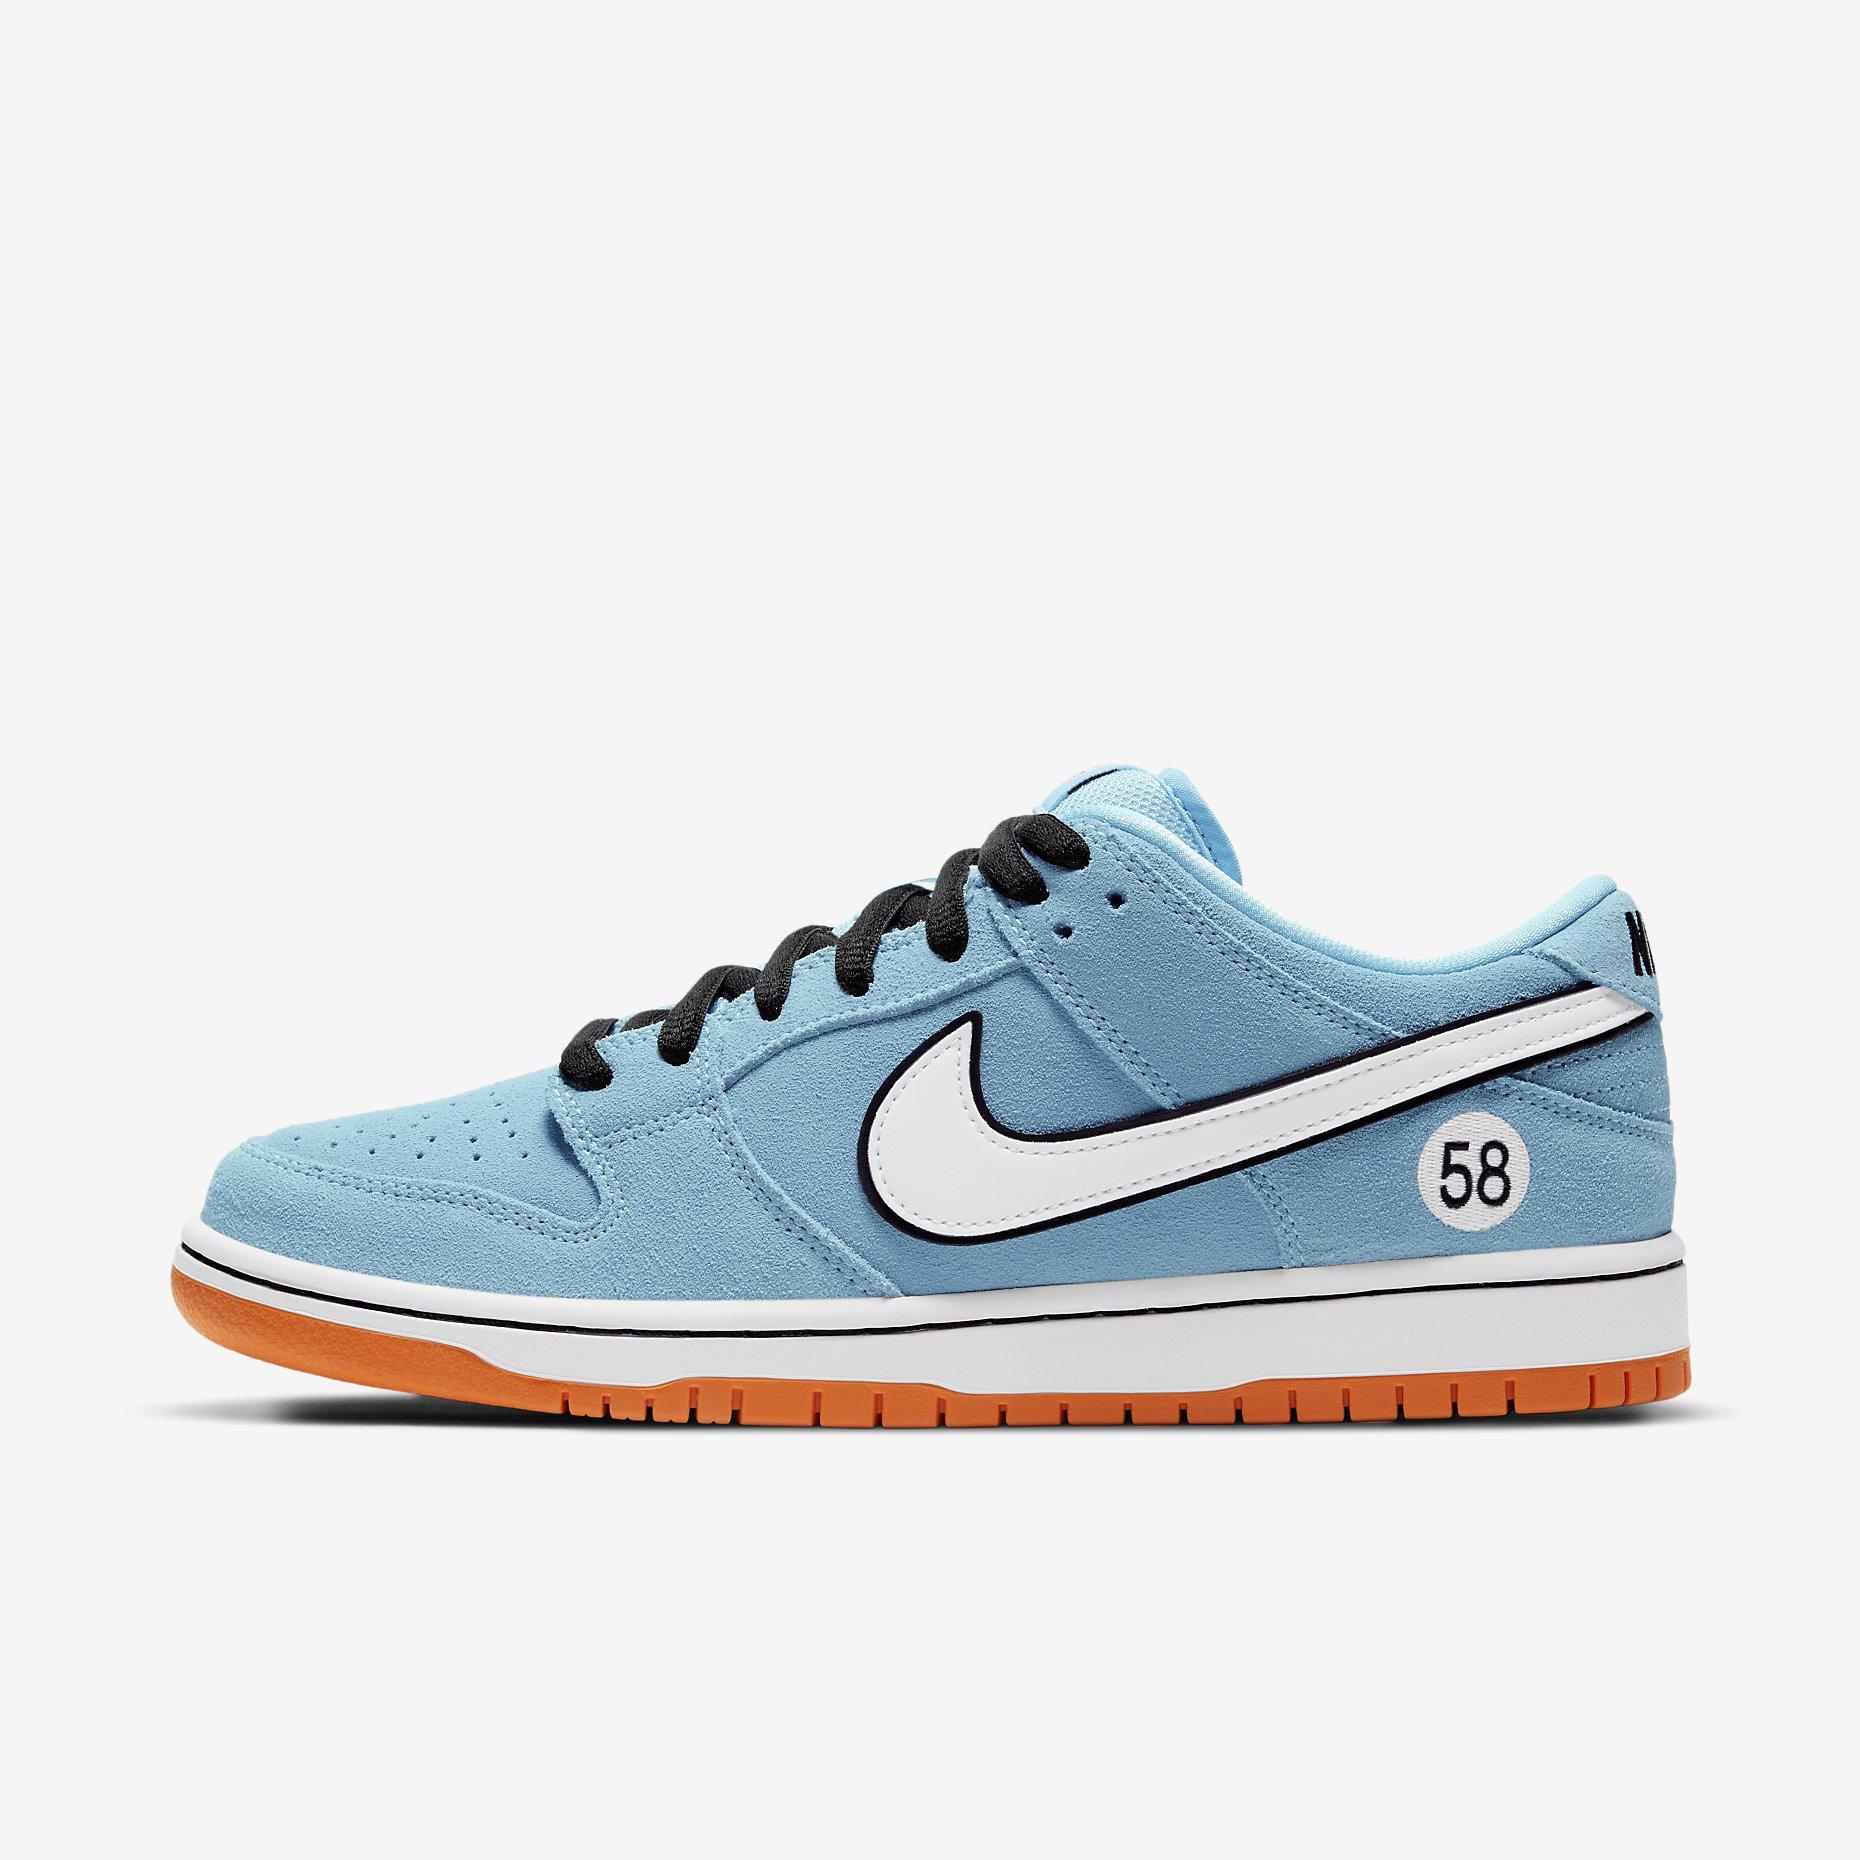 Nike SB Dunk Low Pro Gulf - Club 58}